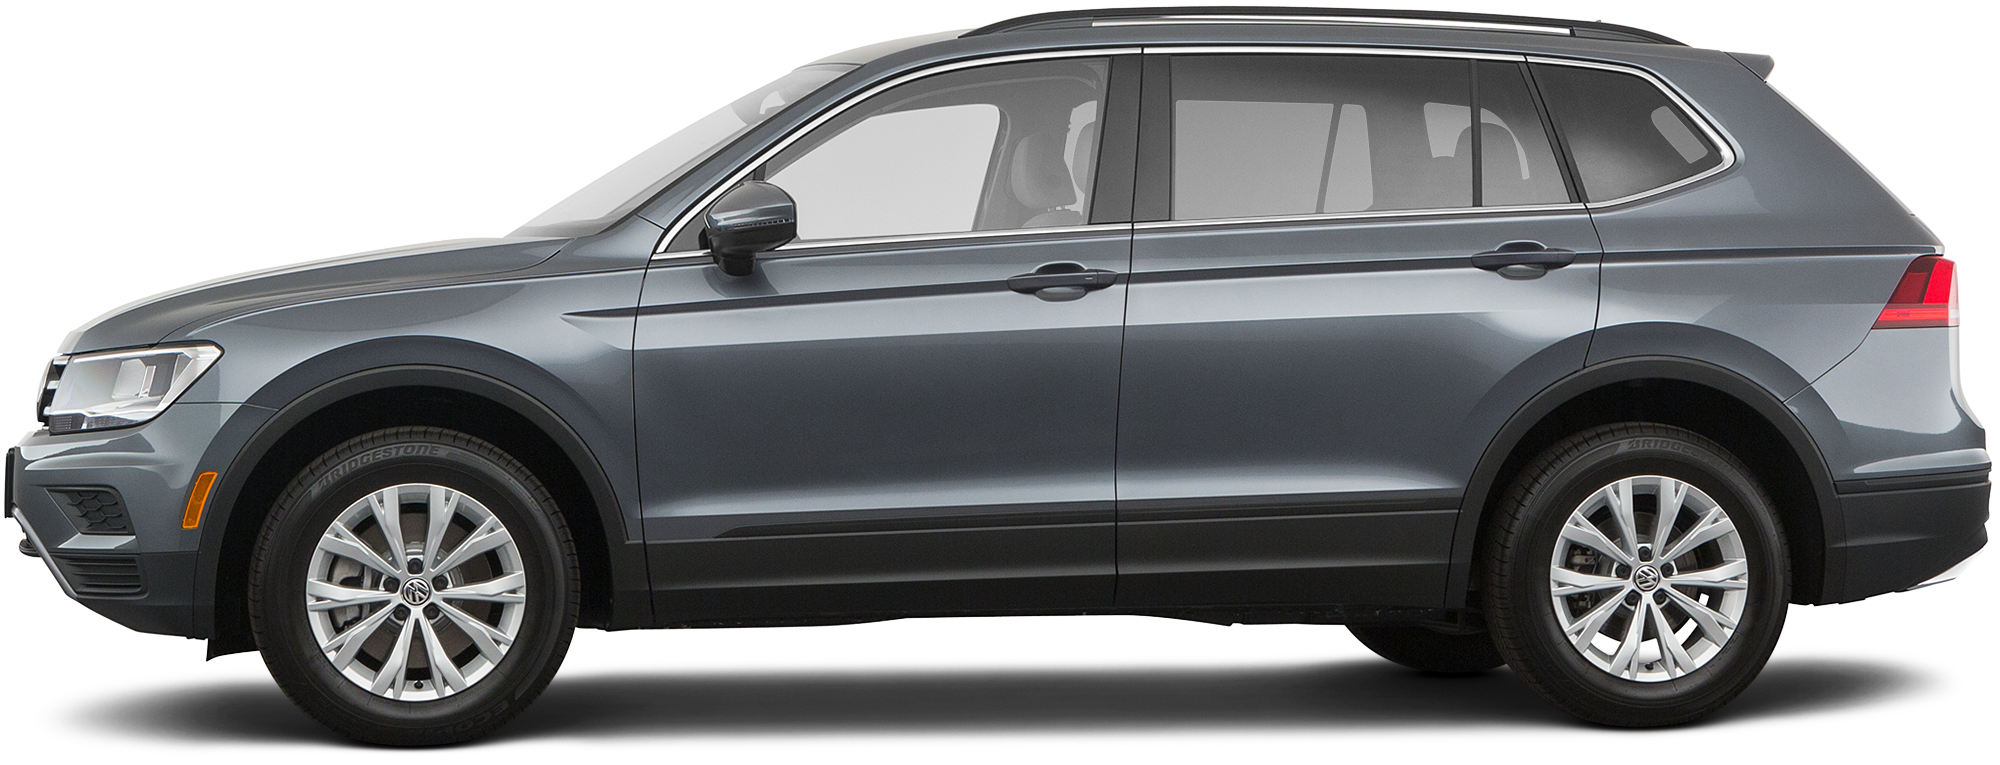 2020 Volkswagen Tiguan SUV 2.0T S 4MOTION